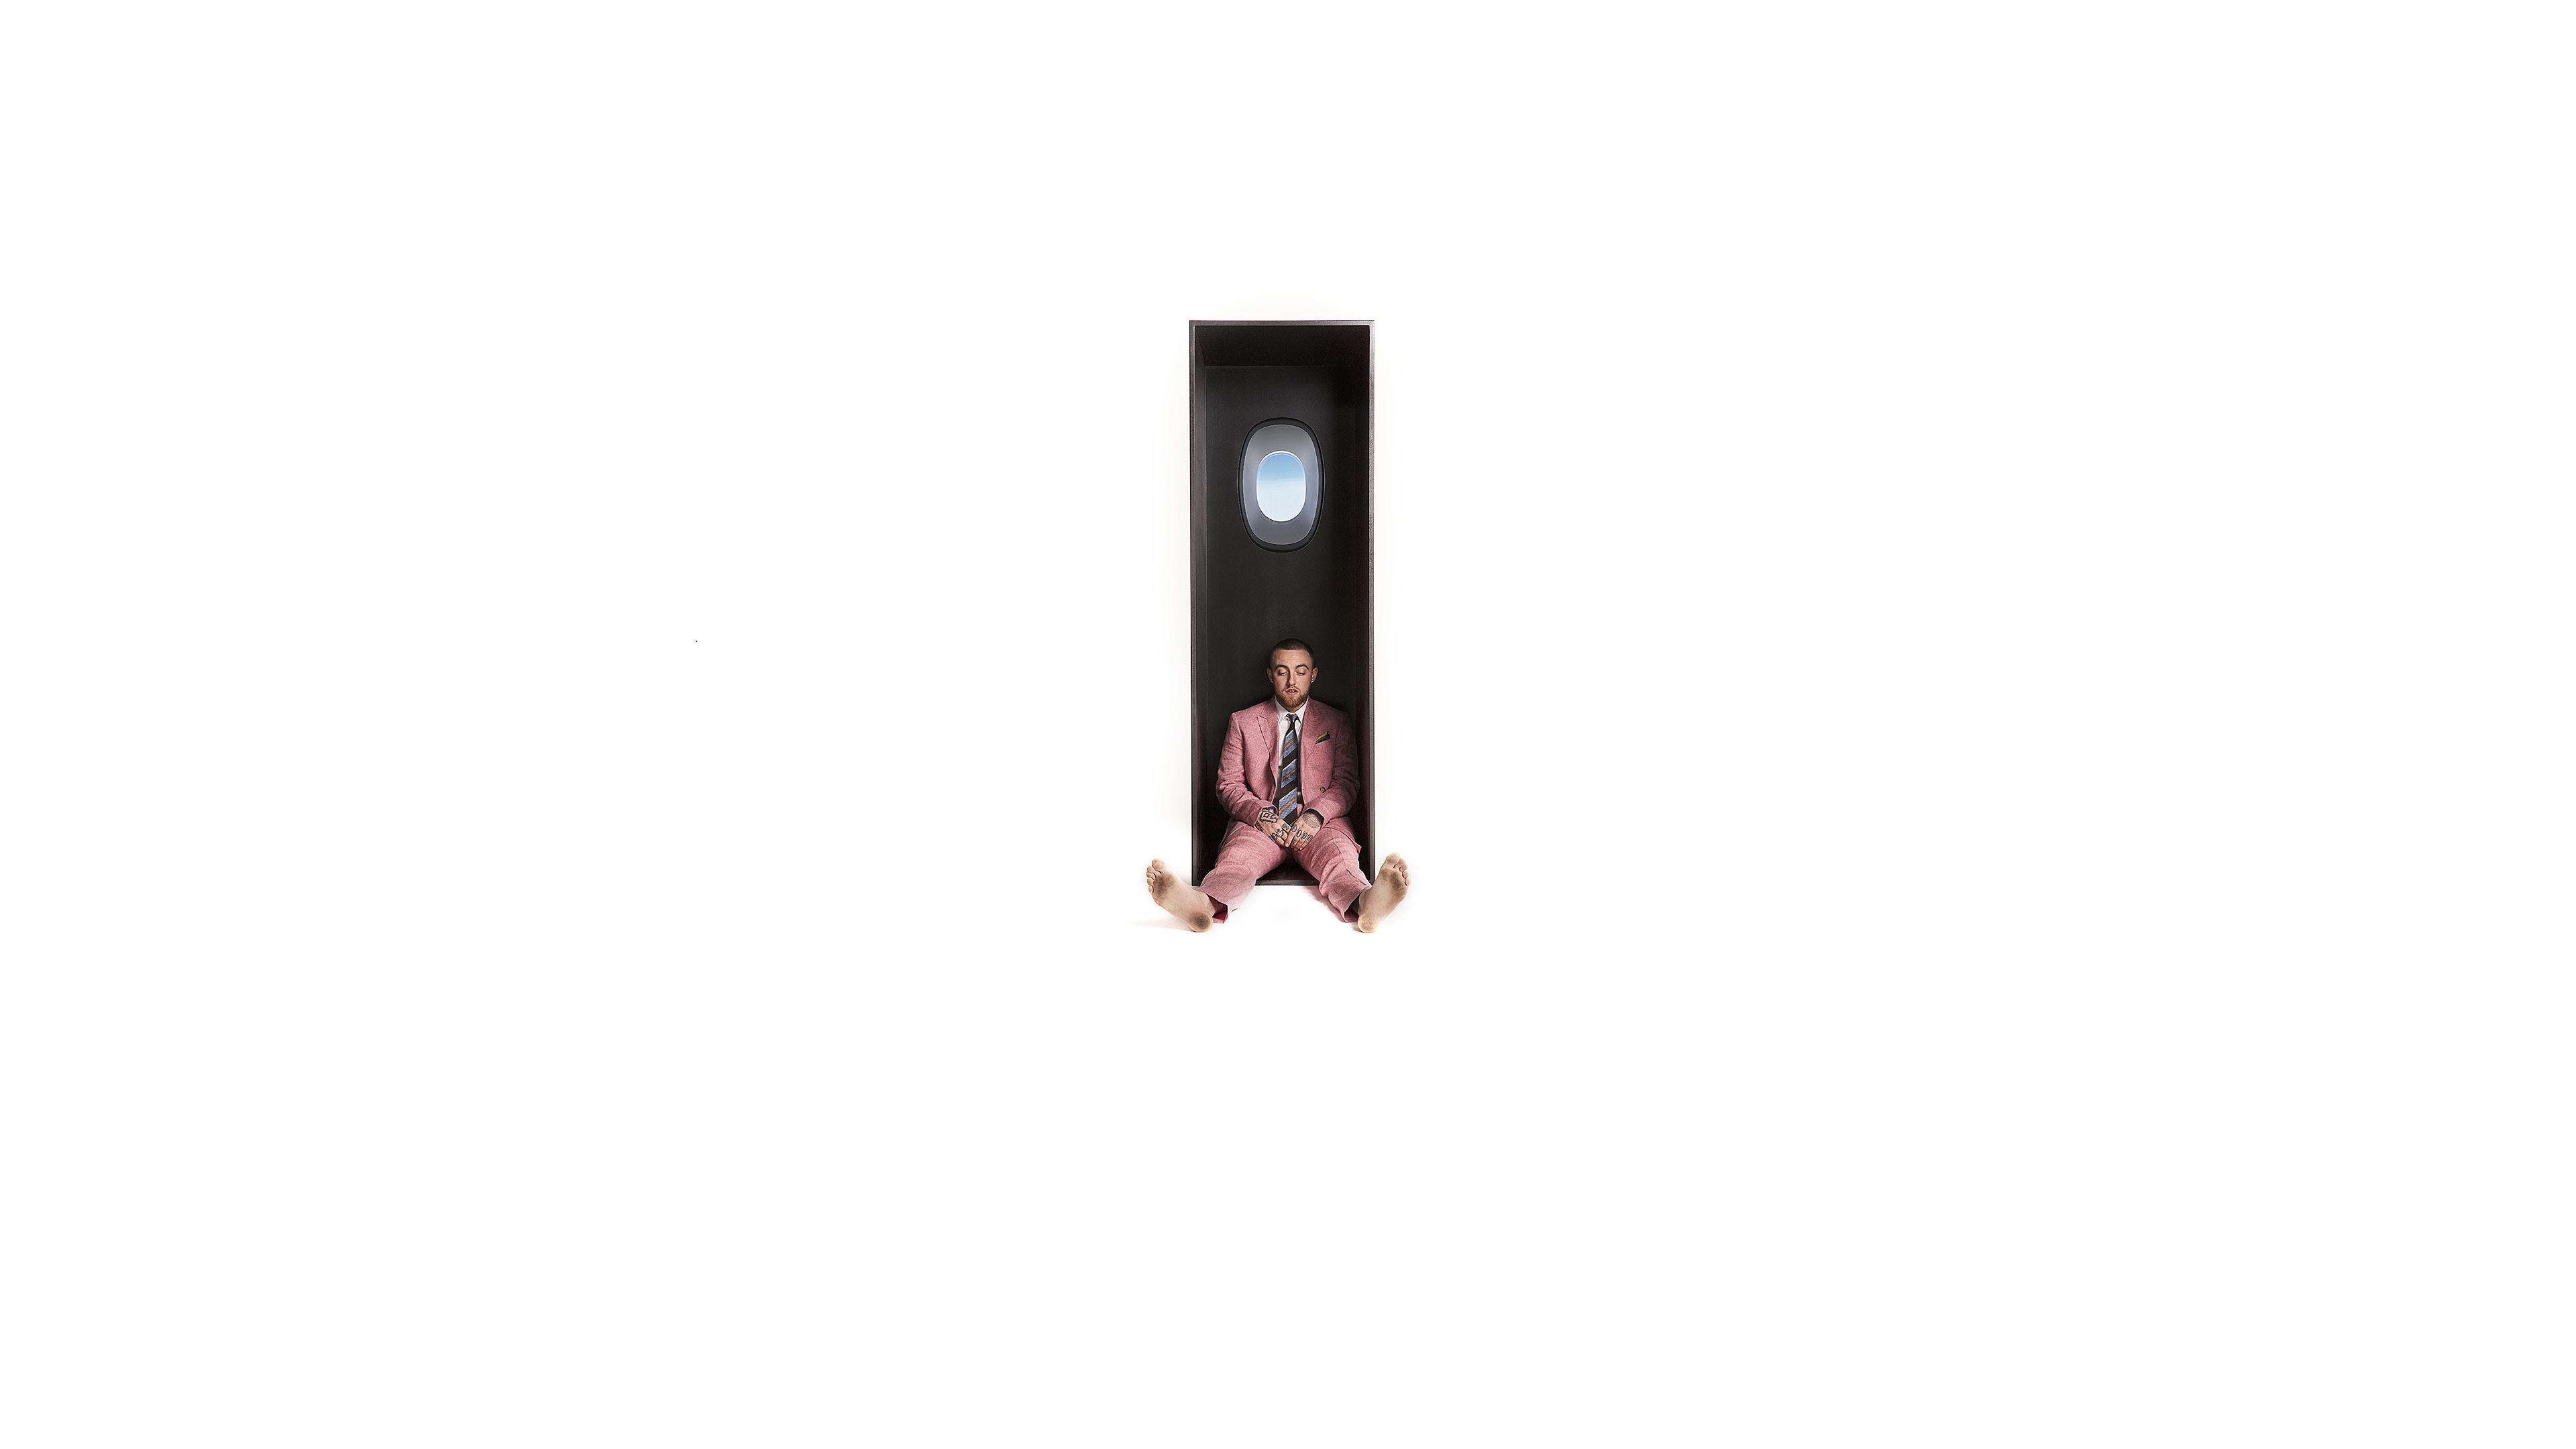 Rip Mac Miller 3840x2160 Mac Miller Wallpaper Mac